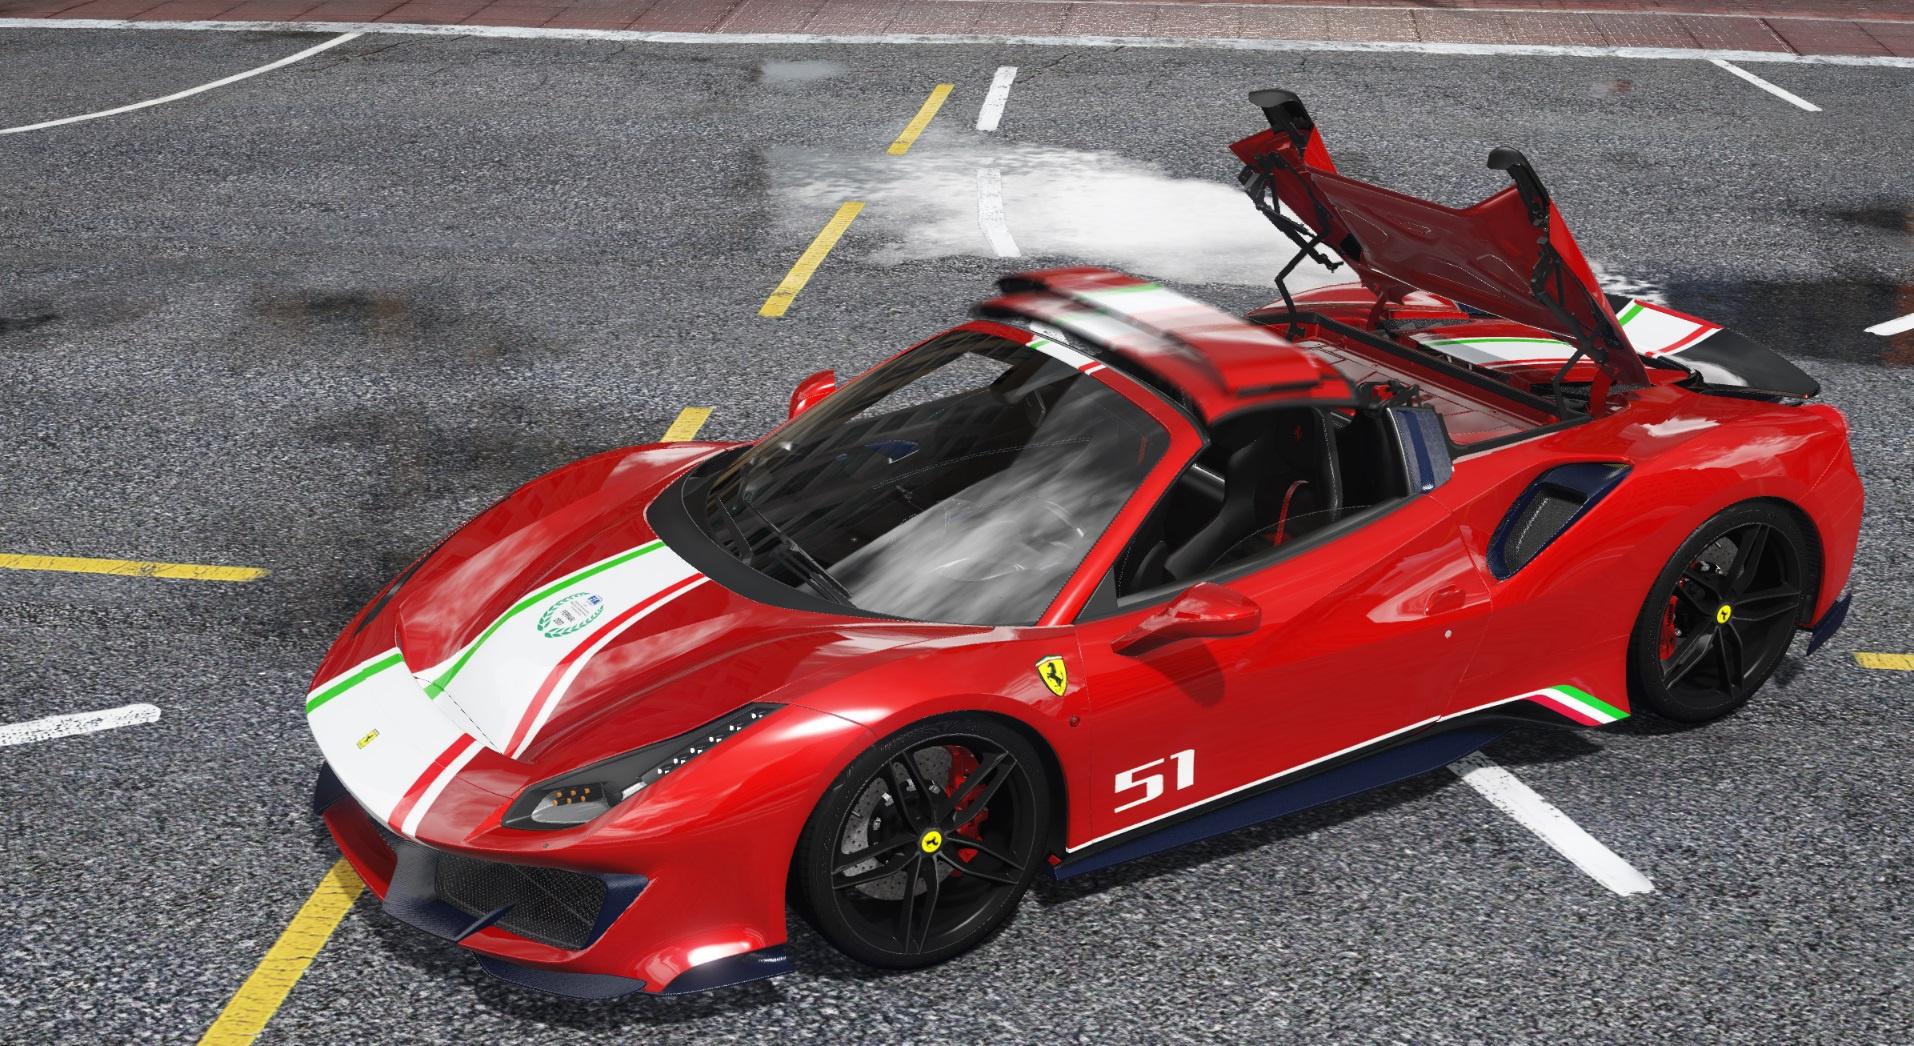 2019 Ferrari 488 Pista Spider Animated Roofadd Ontemplate